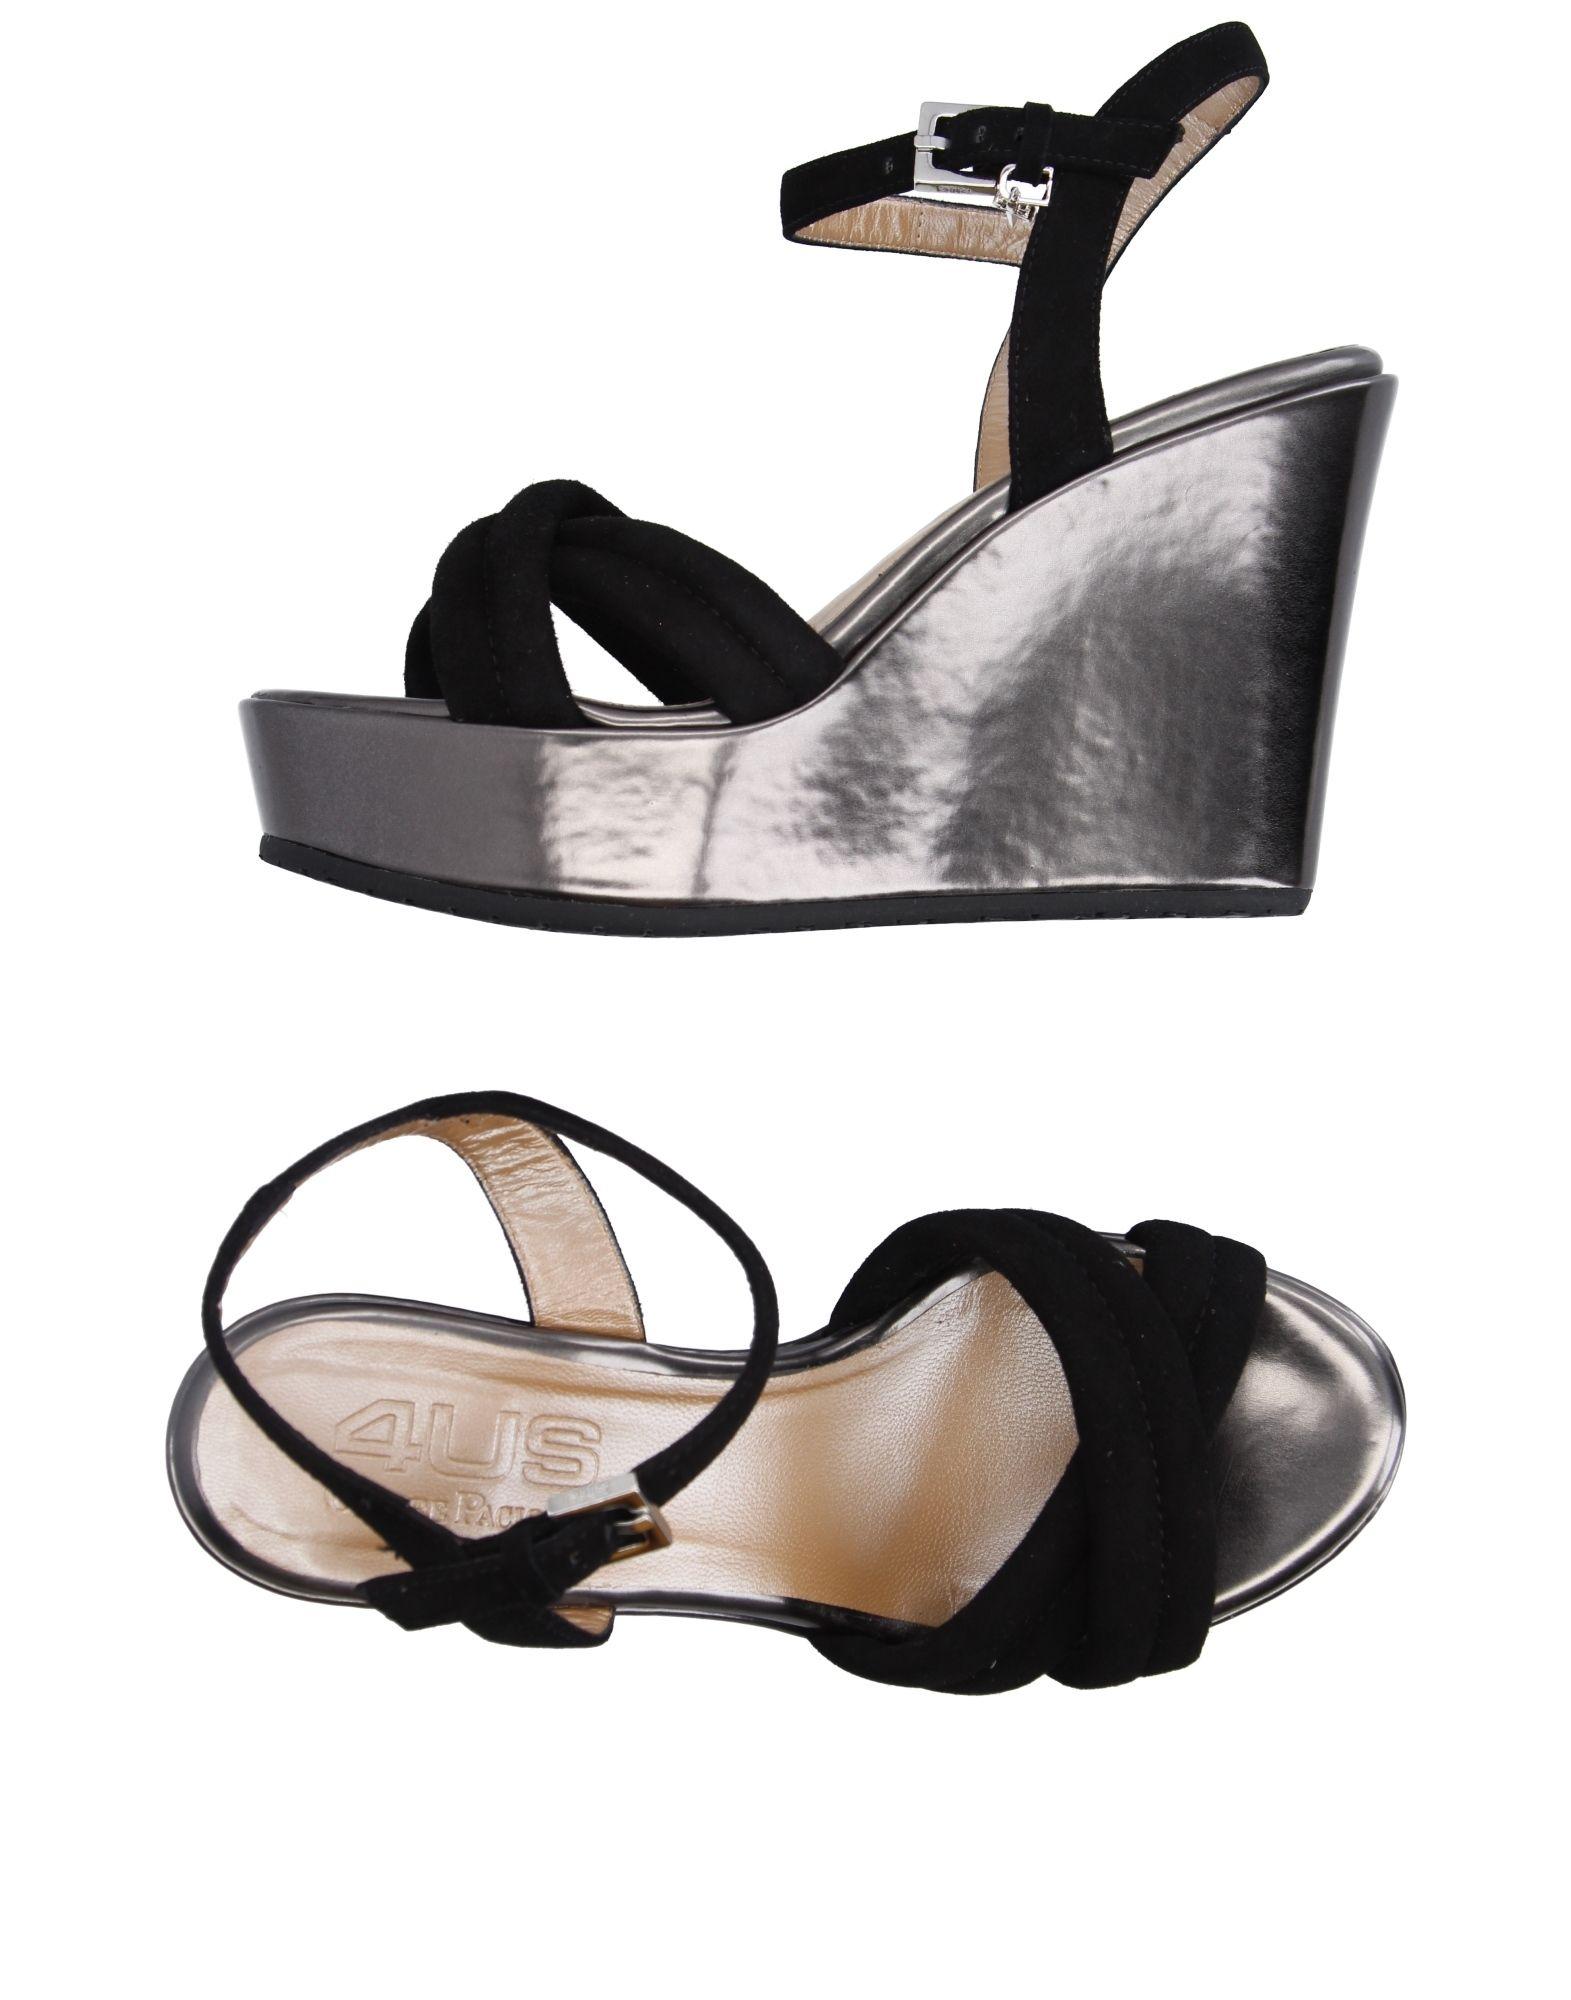 Cesare Paciotti 4Us Sandalen Damen  11137754PX Gute Qualität beliebte Schuhe